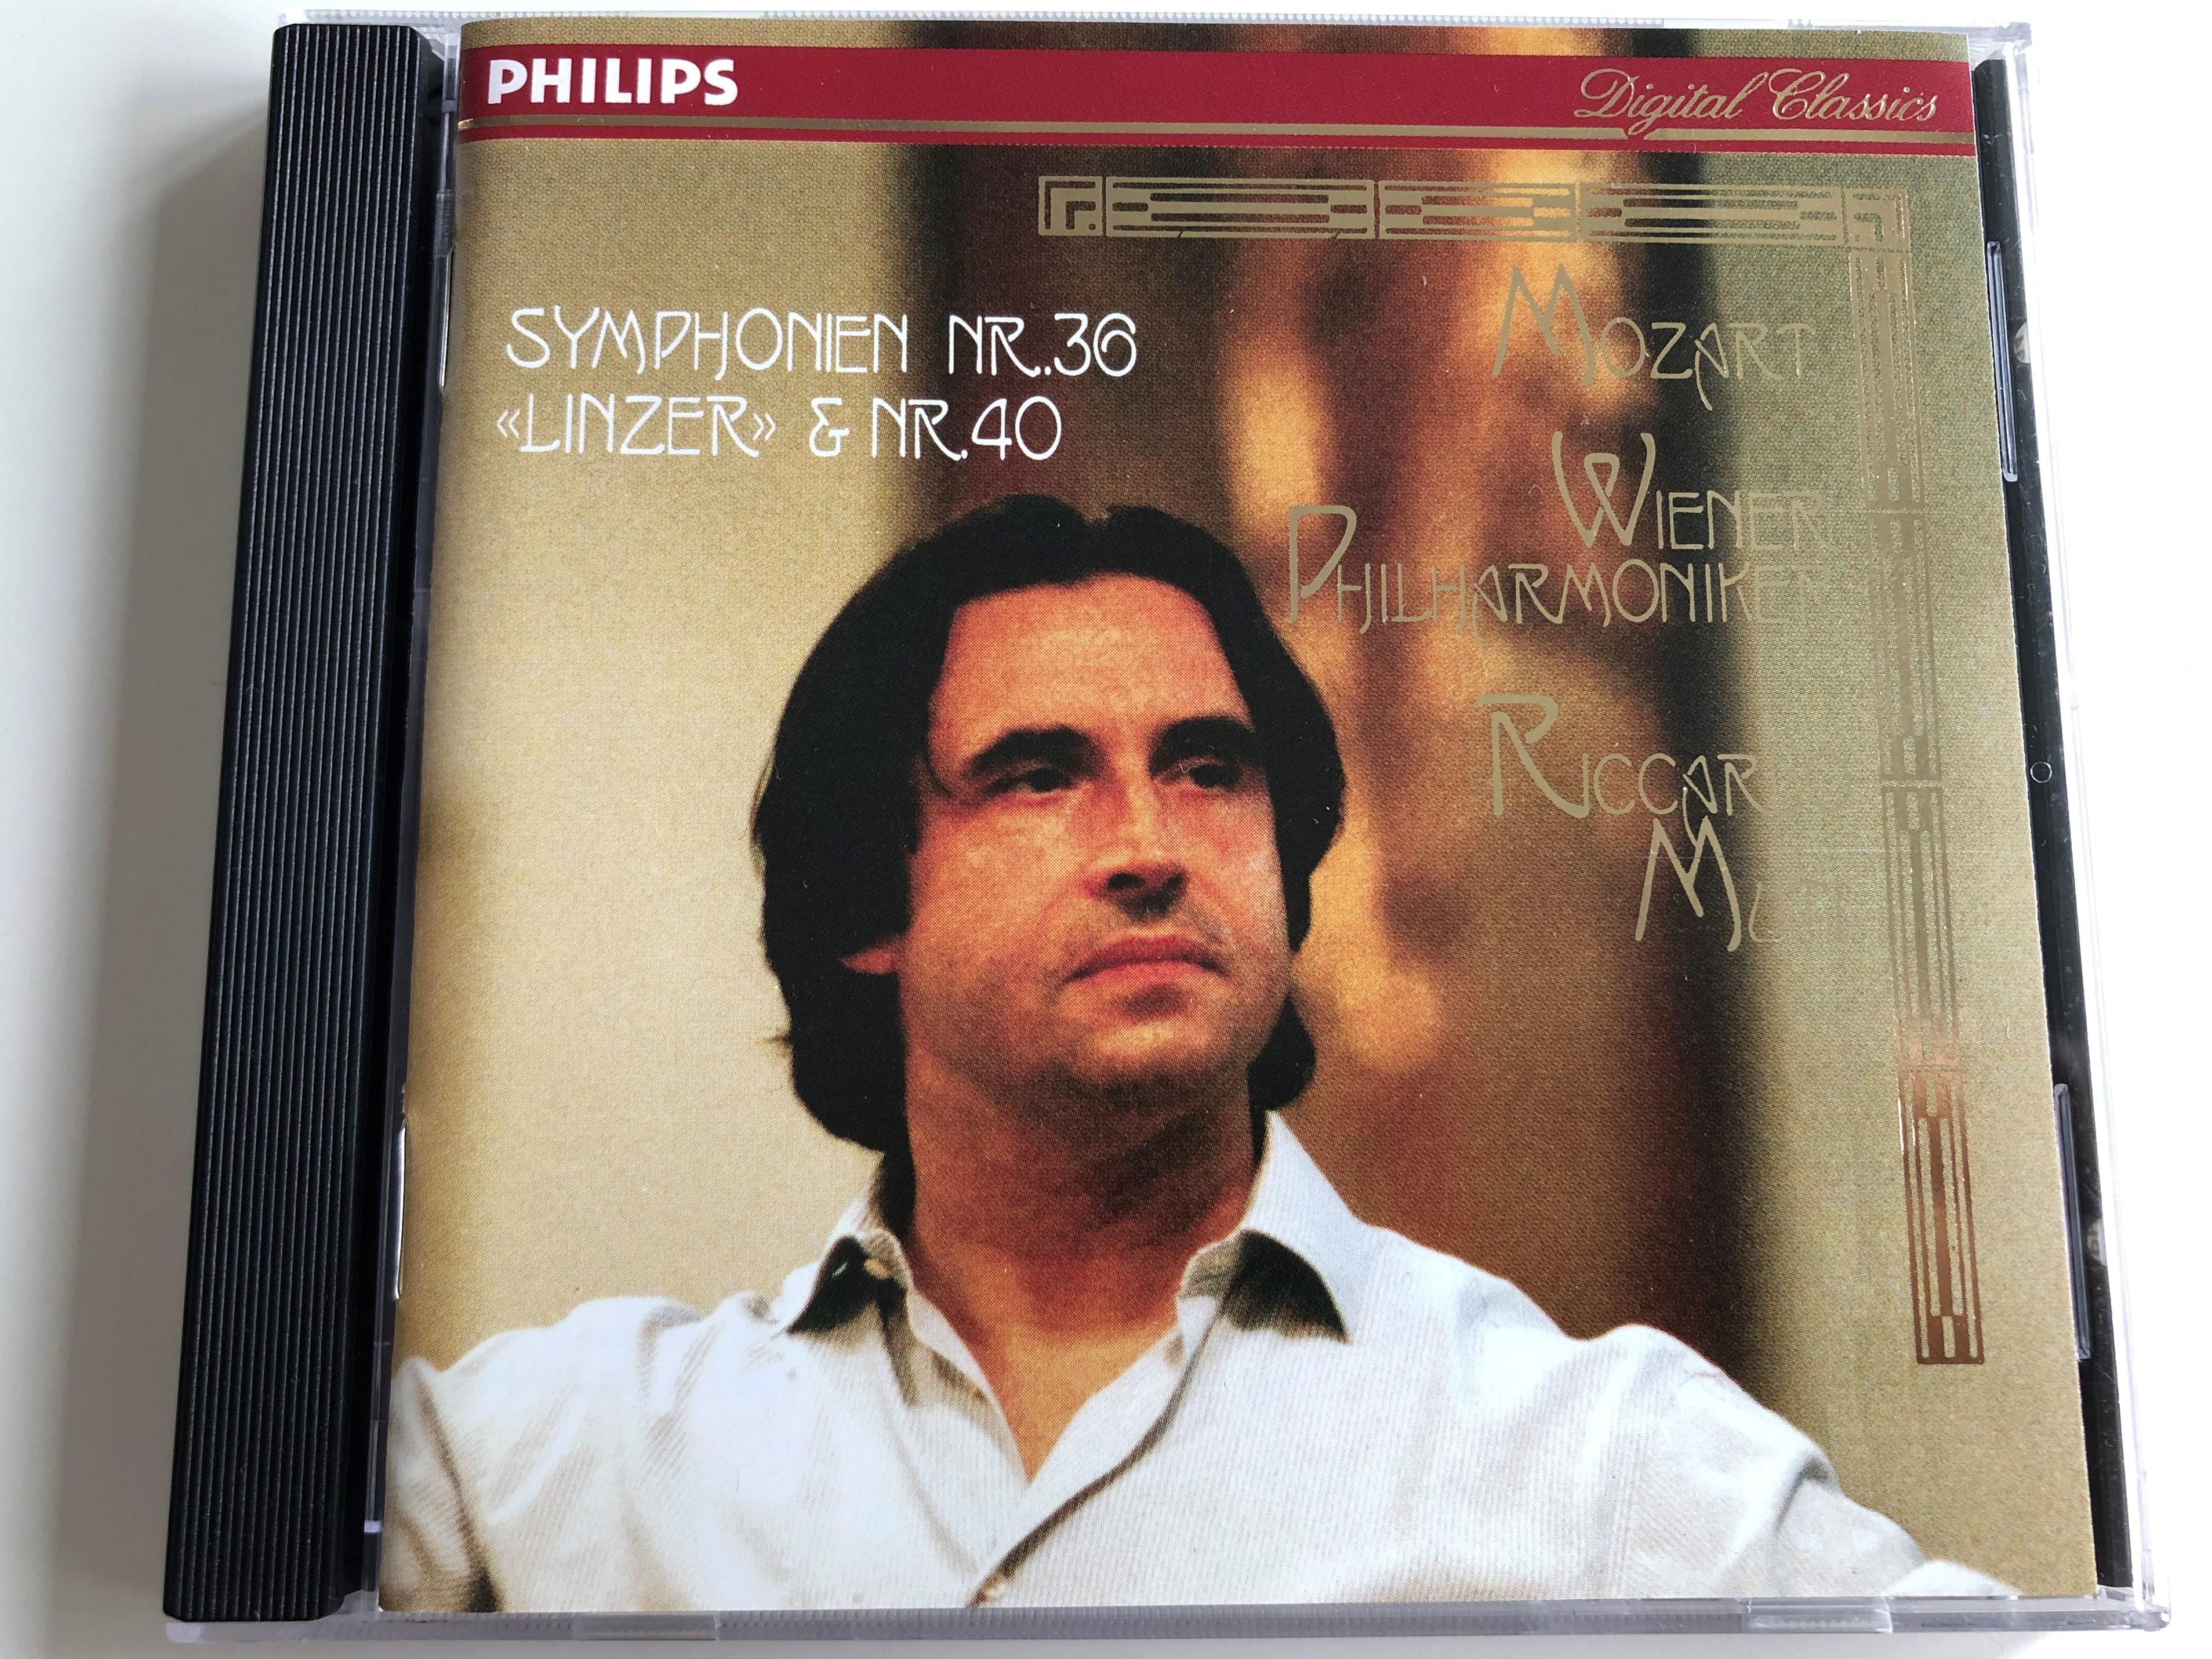 w.a.-mozart-symphonien-nr.-36-linzer-nr.-40-wiener-philharmoniker-conducted-by-riccardo-muti-audio-cd-1993-philips-digital-classics-1-.jpg